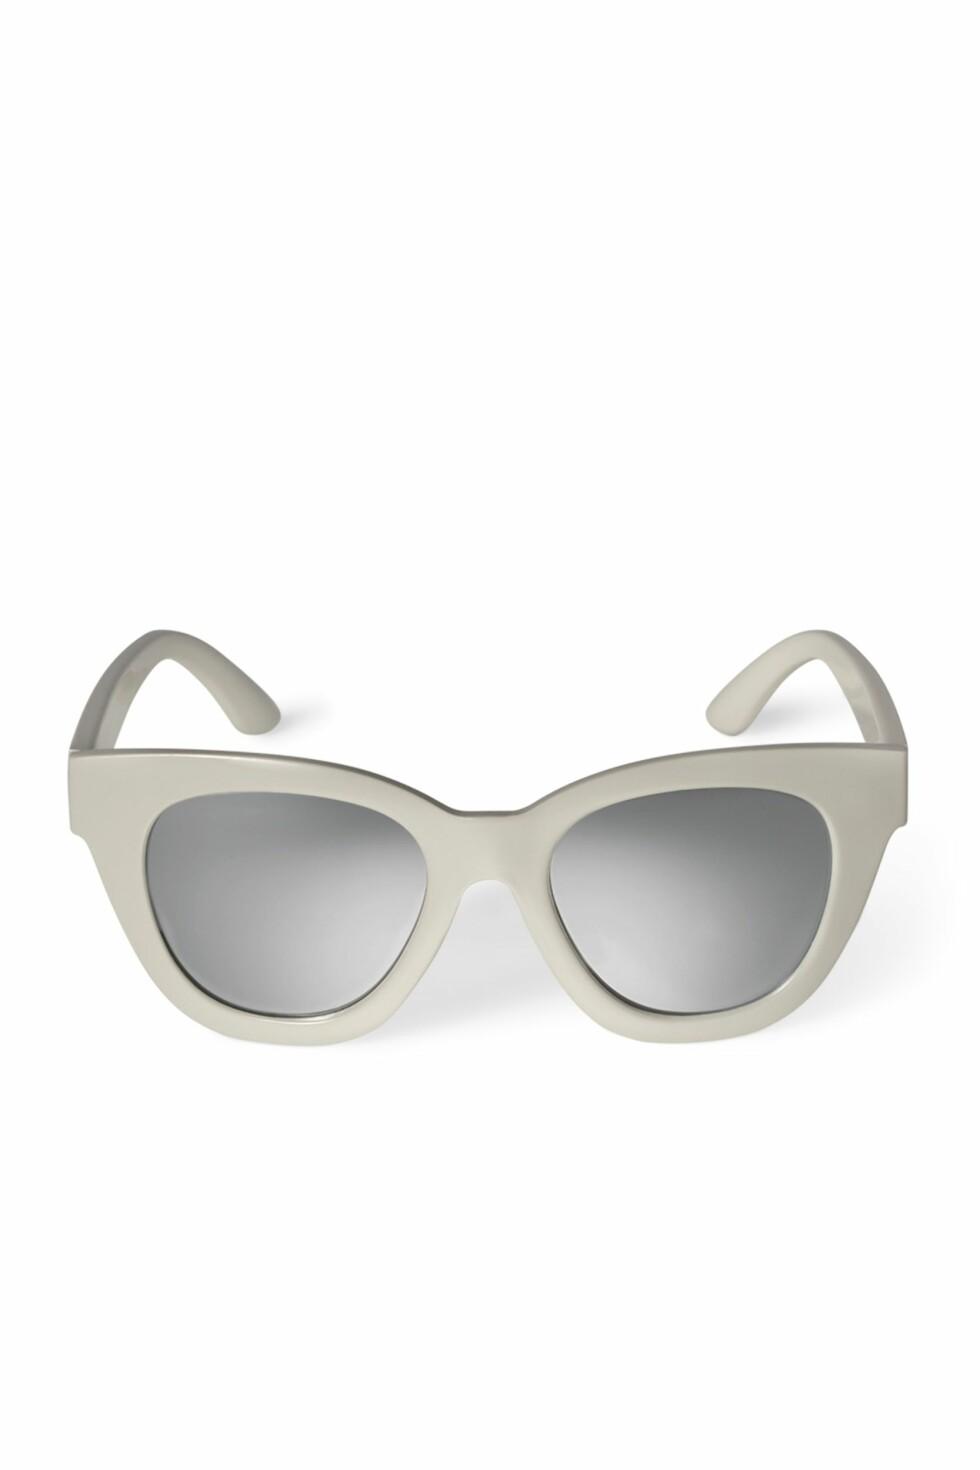 Solbriller fra Weekday | kr 200 | http://shop.weekday.com/se/Womens_shop/Accessories/Sunglasses/Jetlag_Cateye_Sunglasses/5131397-11756642.1#c-47958